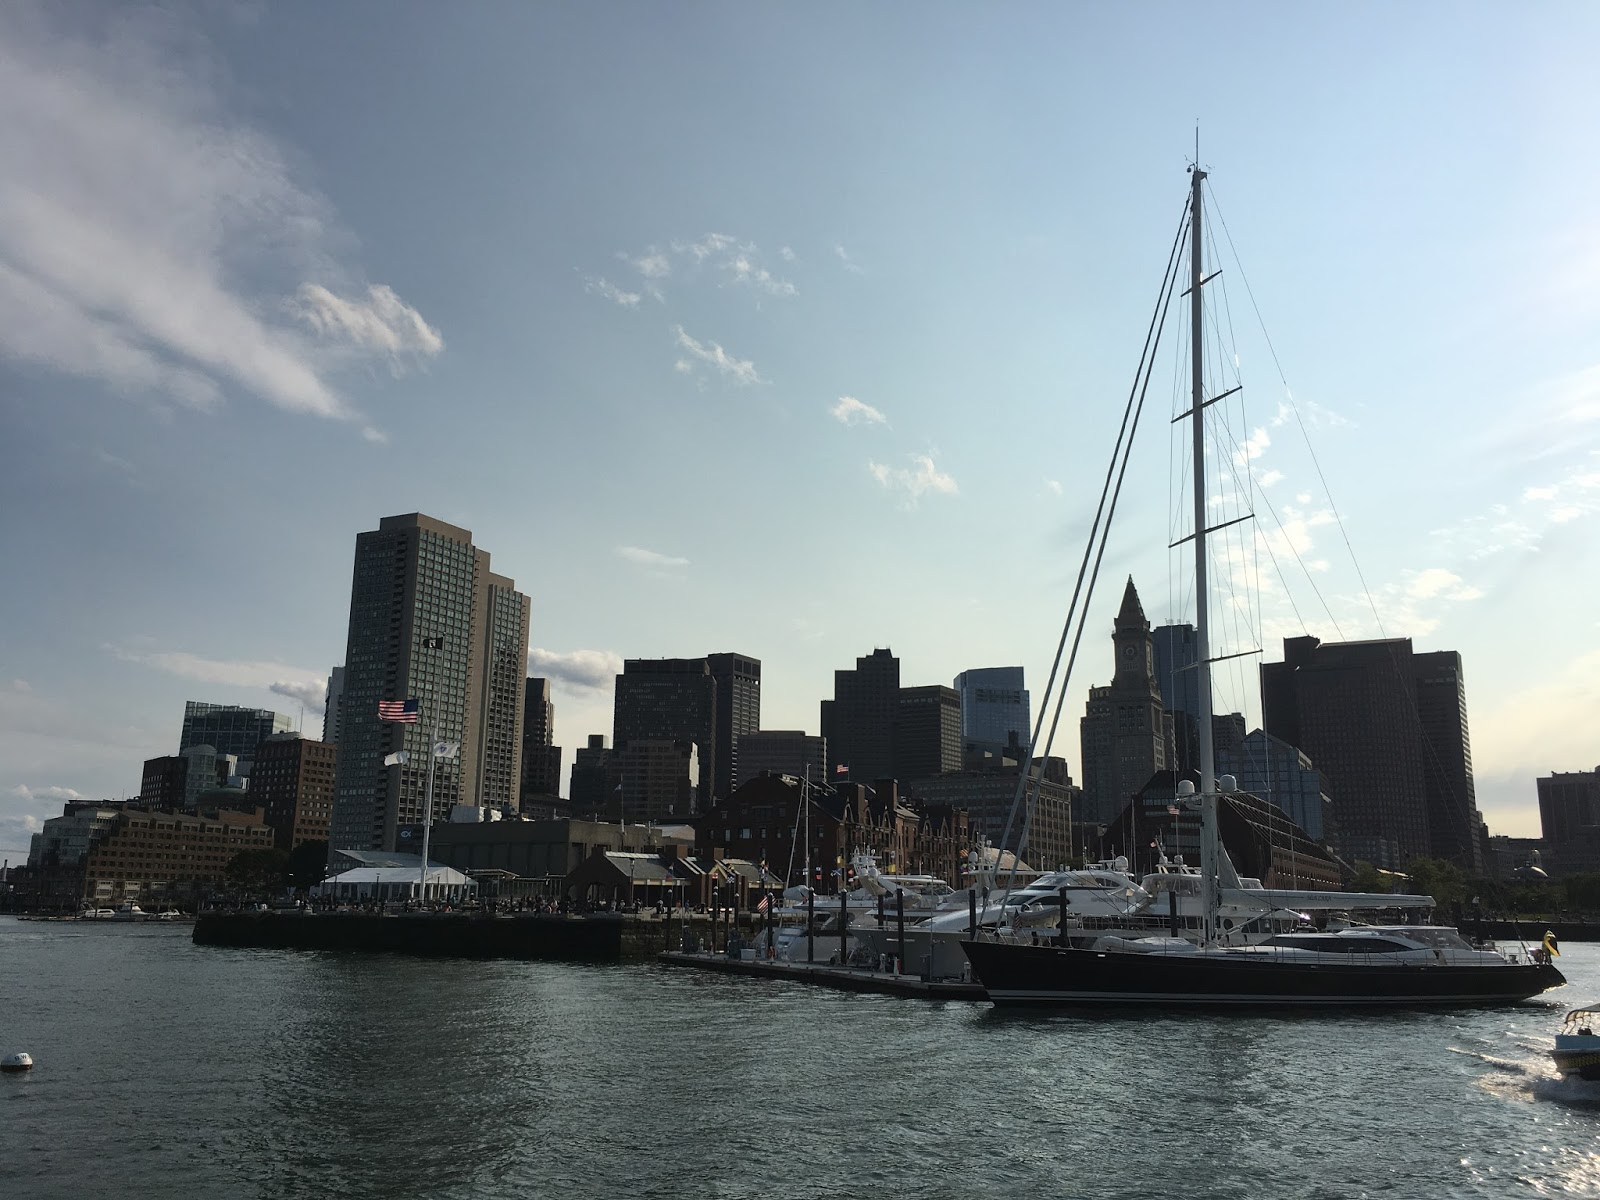 Spectacle-Island-Boston-Harbor-Cruises